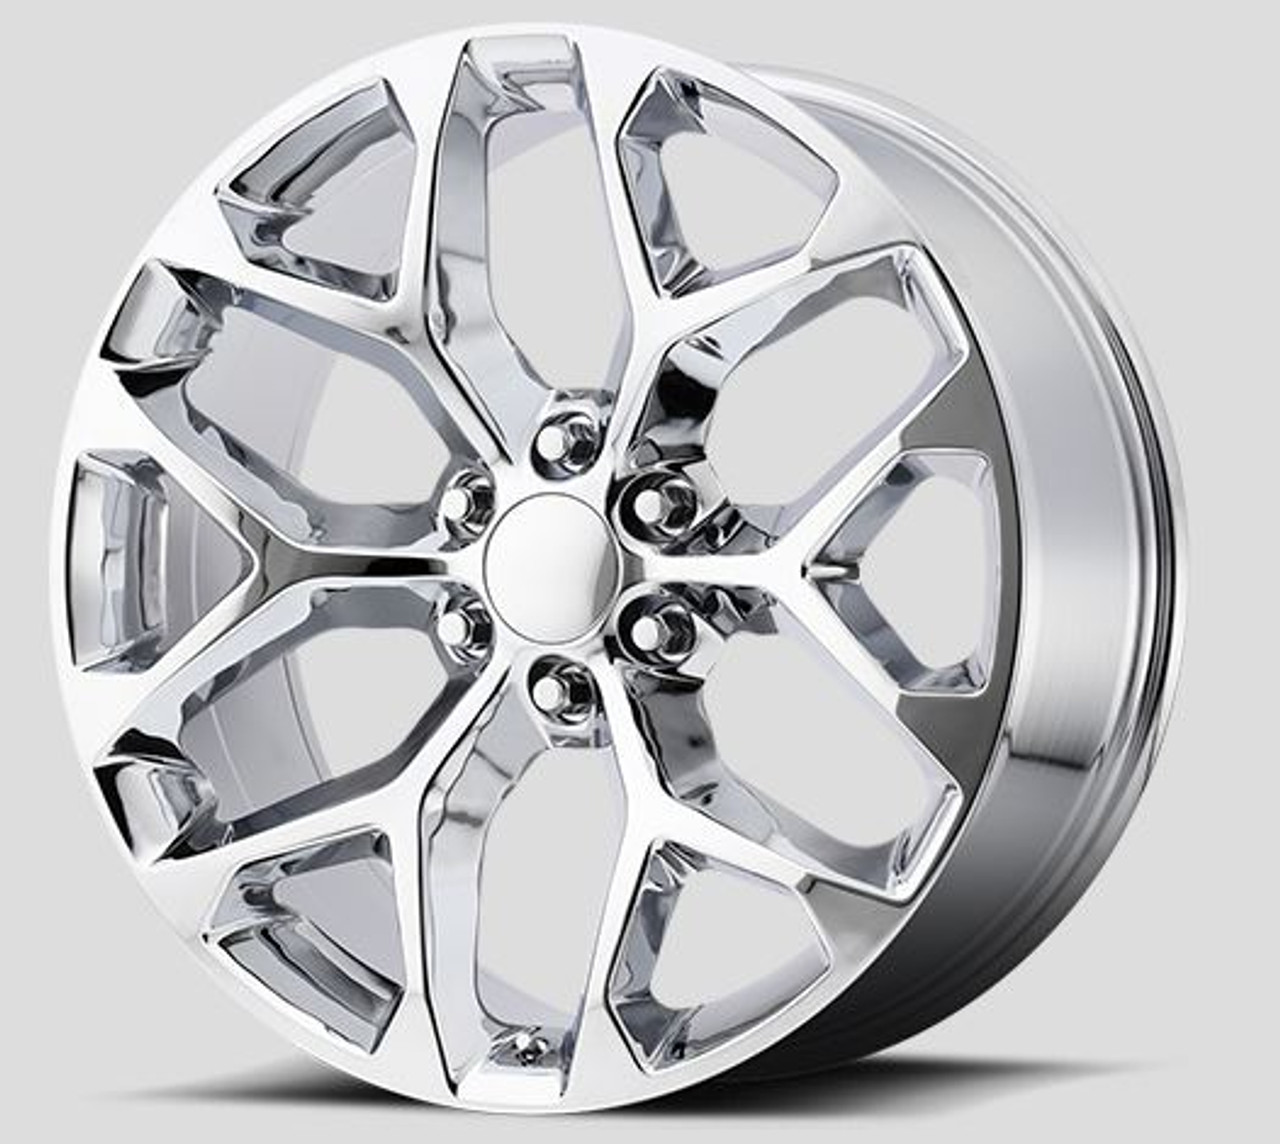 Gm Replica 24 Inch Chrome Snowflake Rims For Silverado Tahoe